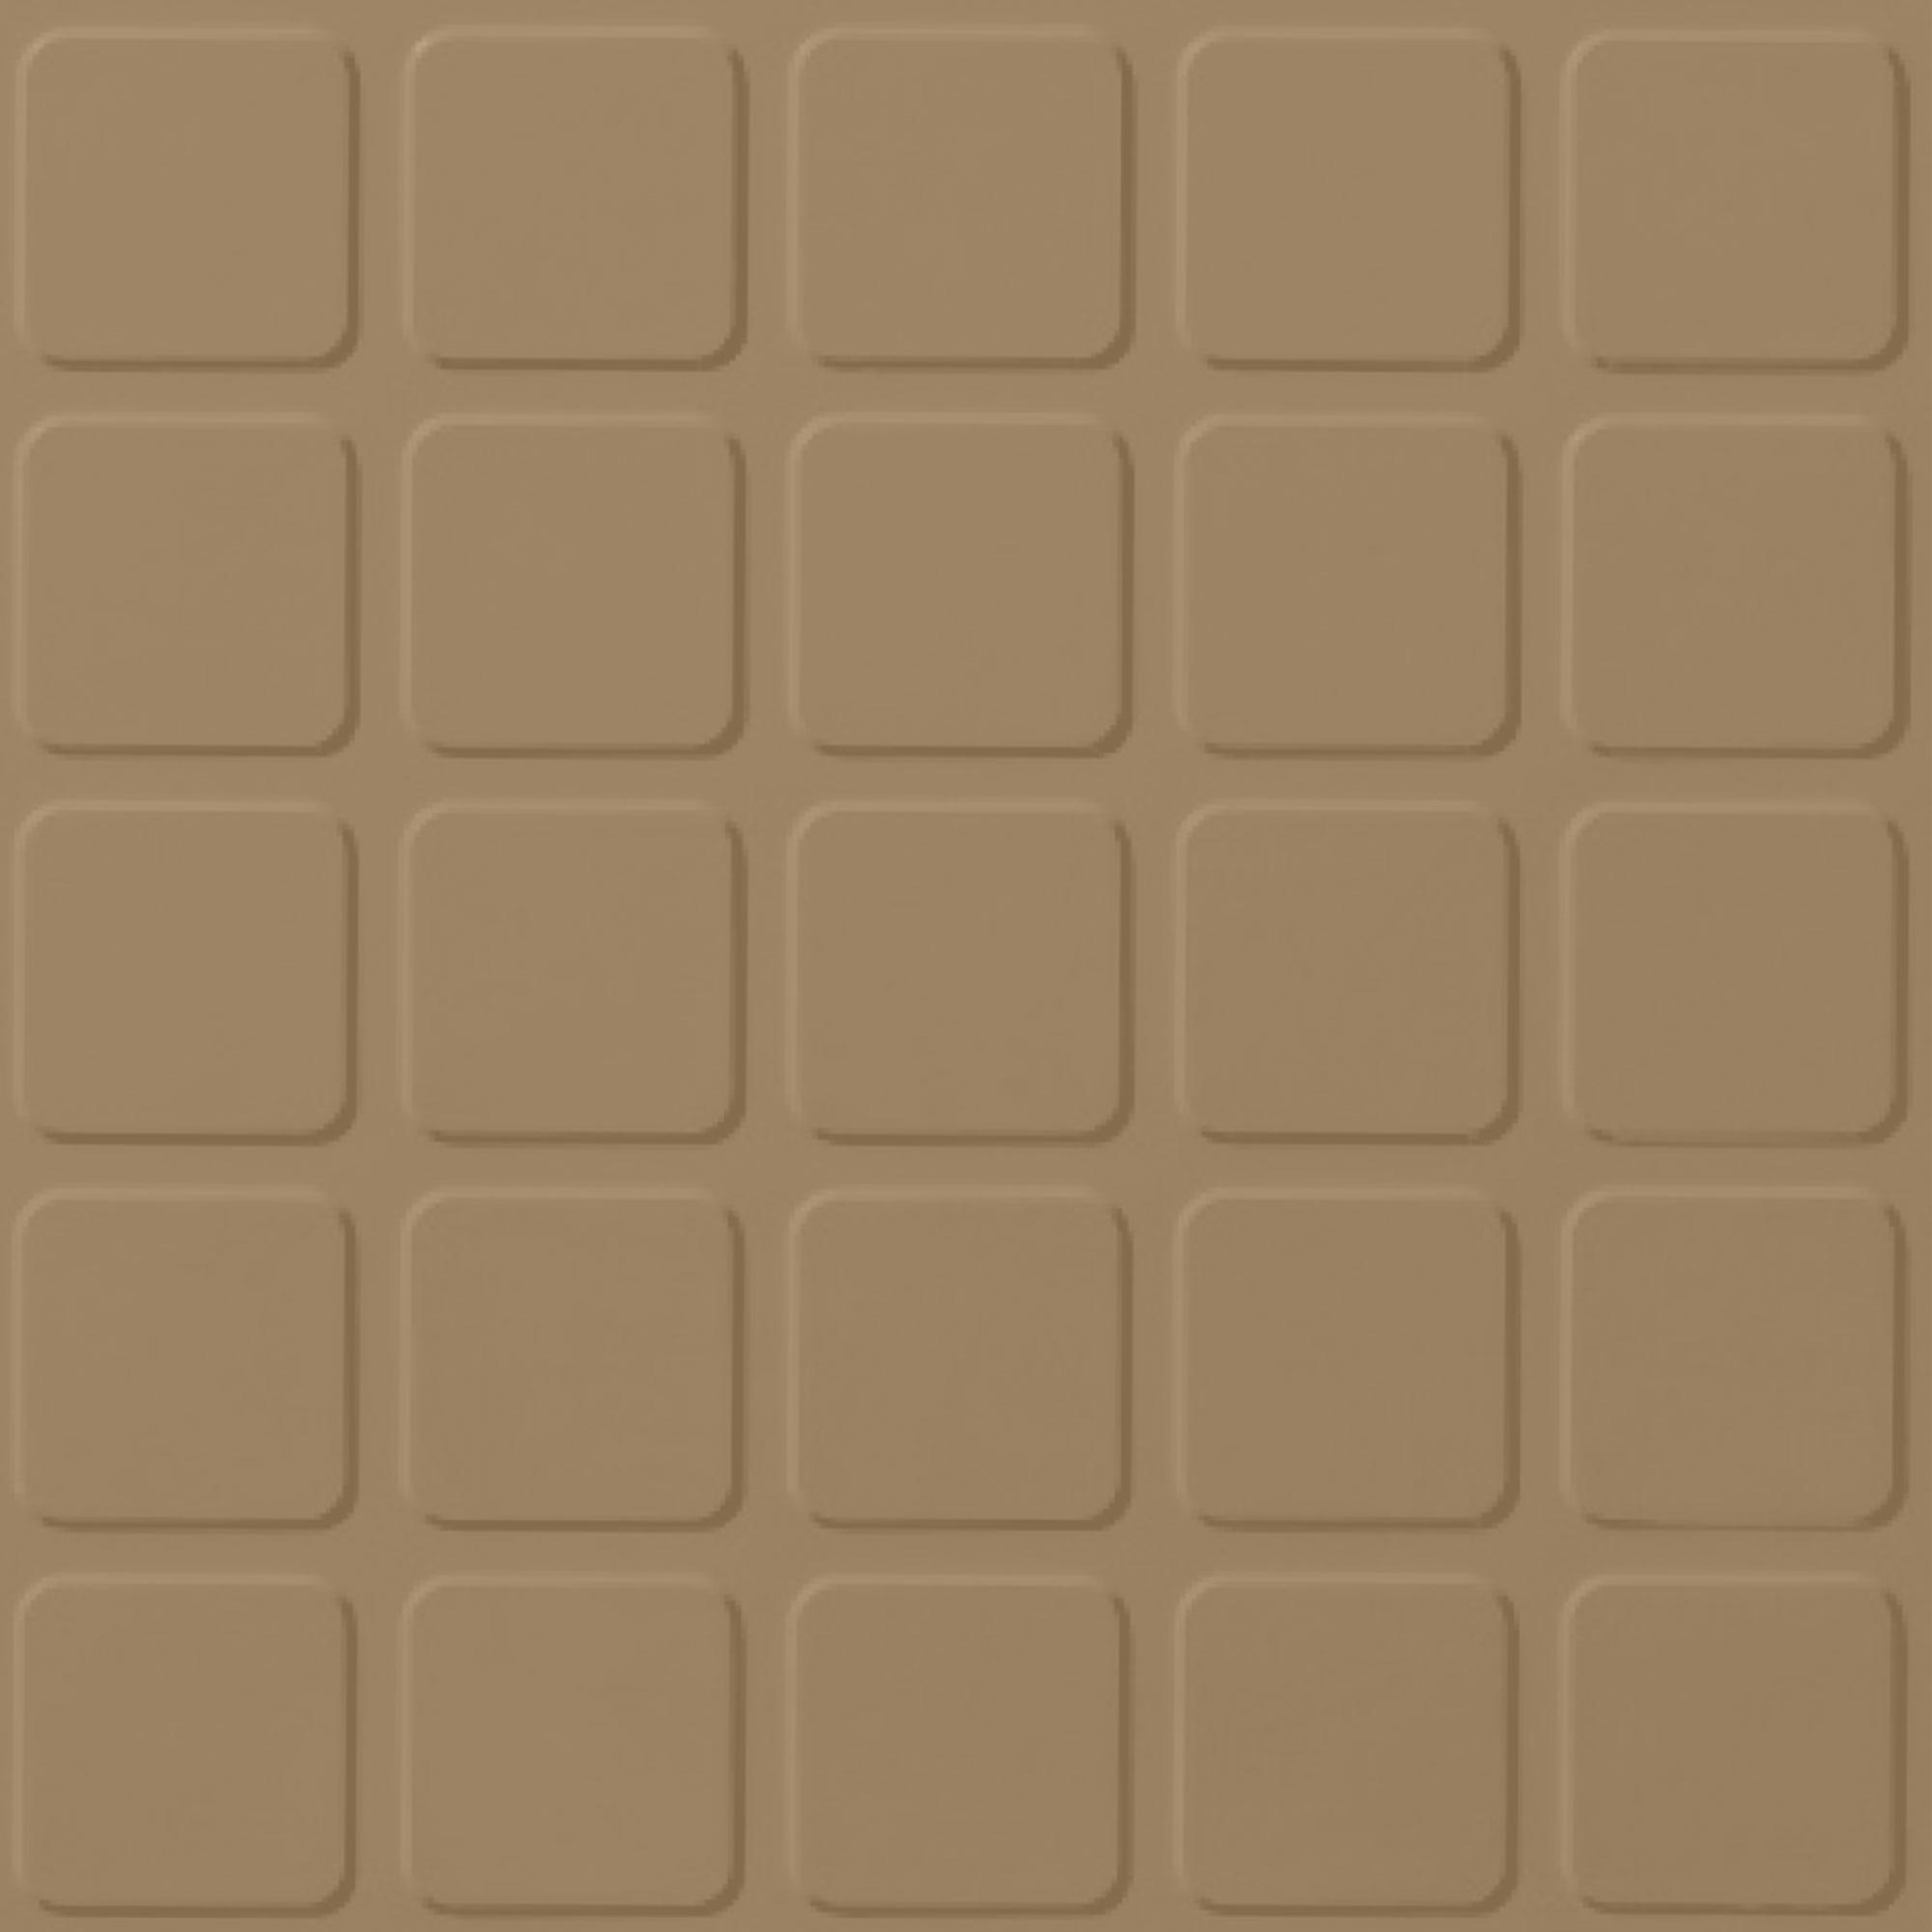 Roppe Rubber Tile 900 - Raised Square Design (994) Sahara Rubber Flooring